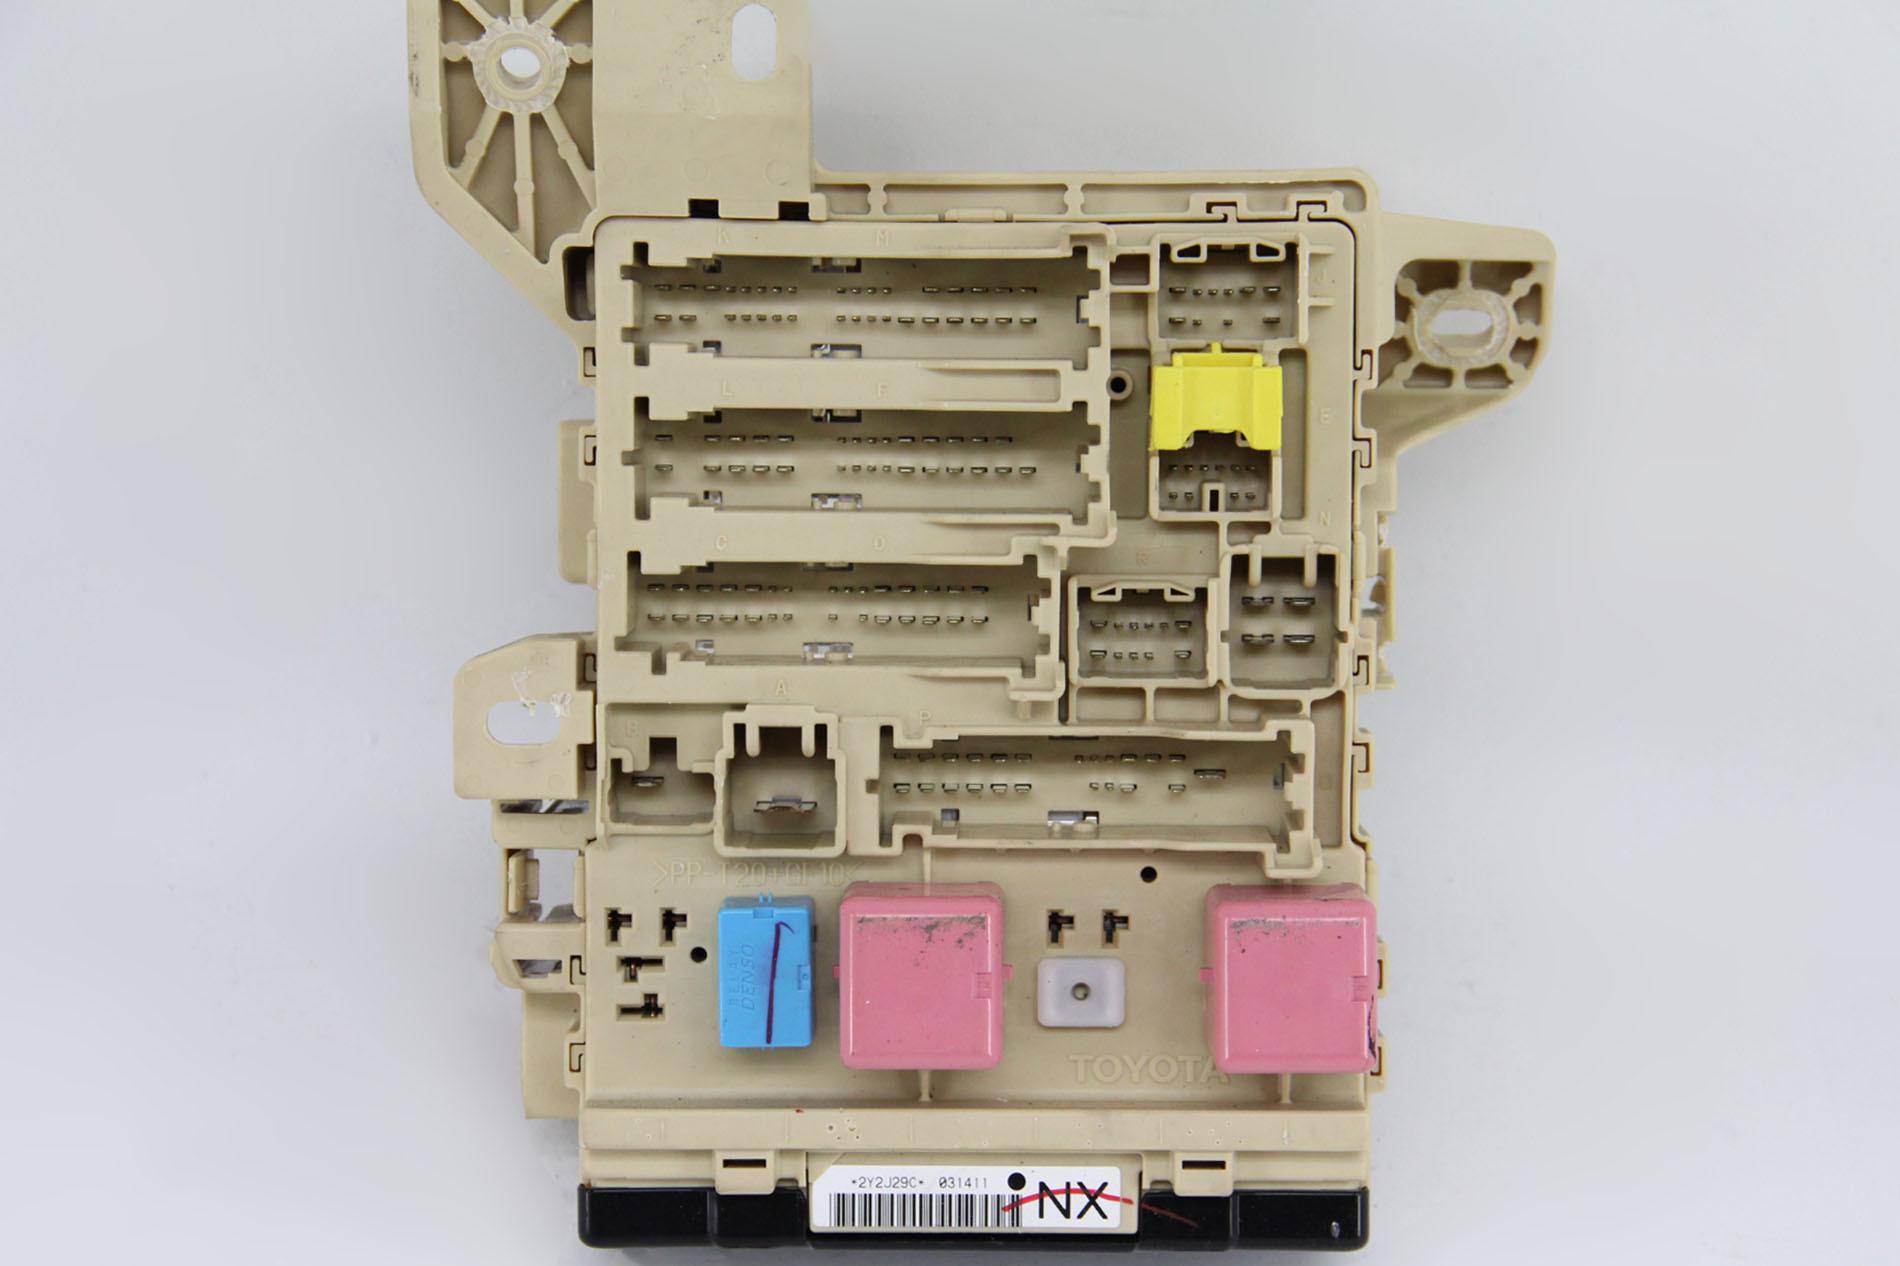 Toyota Camry Hybrid 10-11 Relay Fuse Box, Interior Under Dash 82730-06730  ...